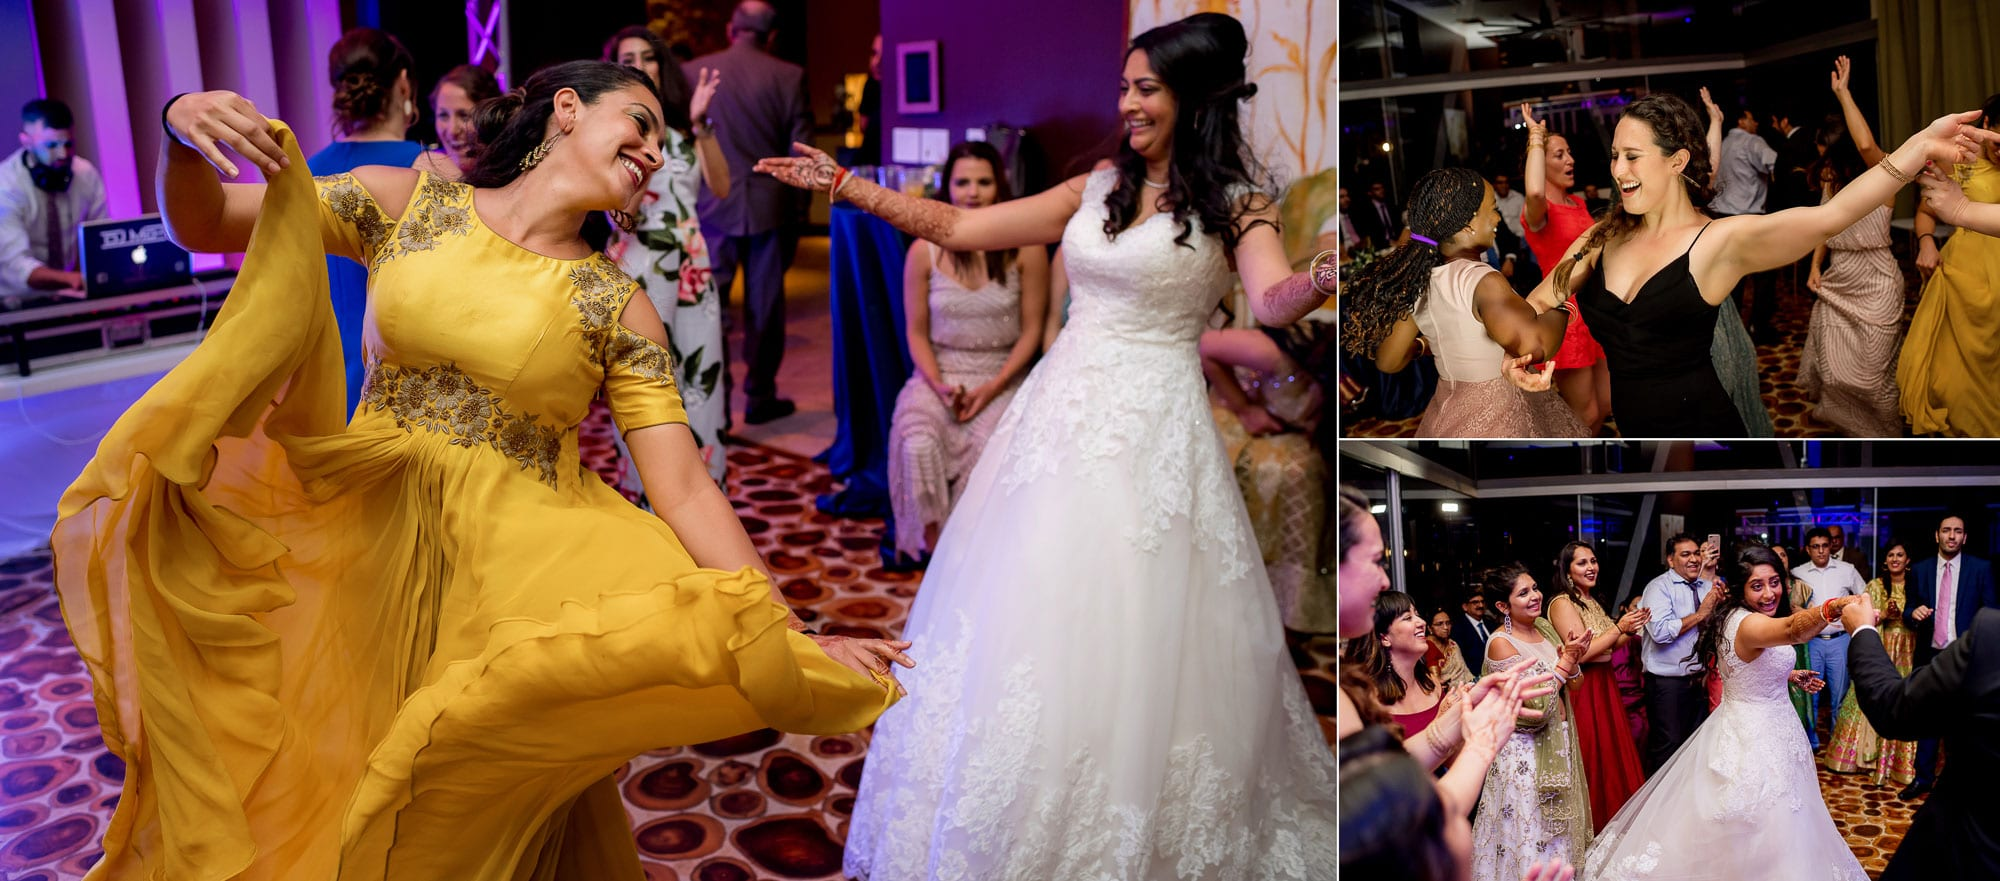 Dancing at the Hindu Muslim wedding reception